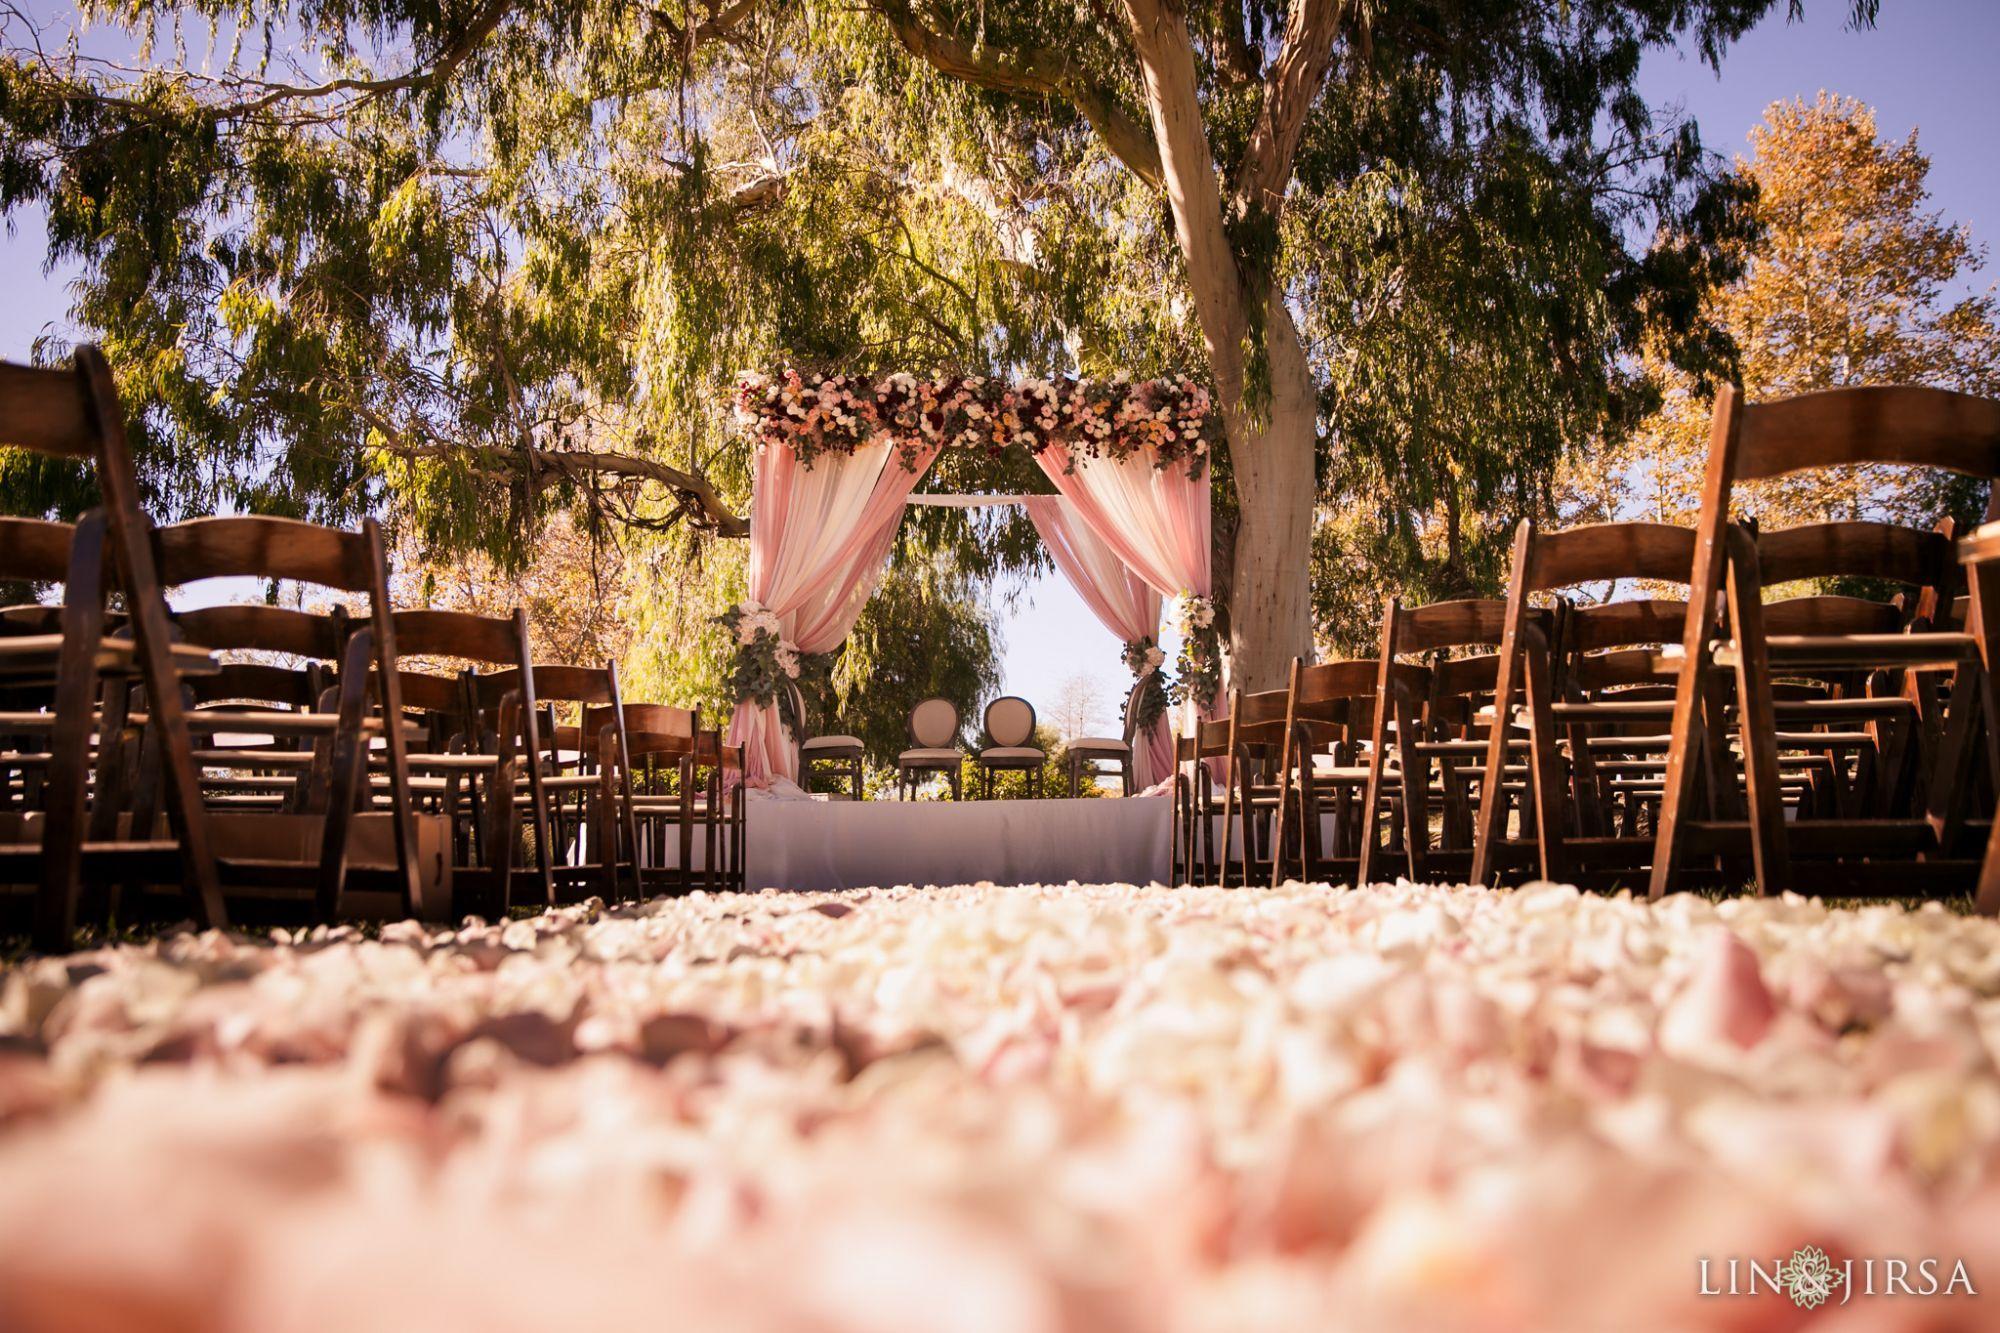 32+ Temecula wedding venues all inclusive information